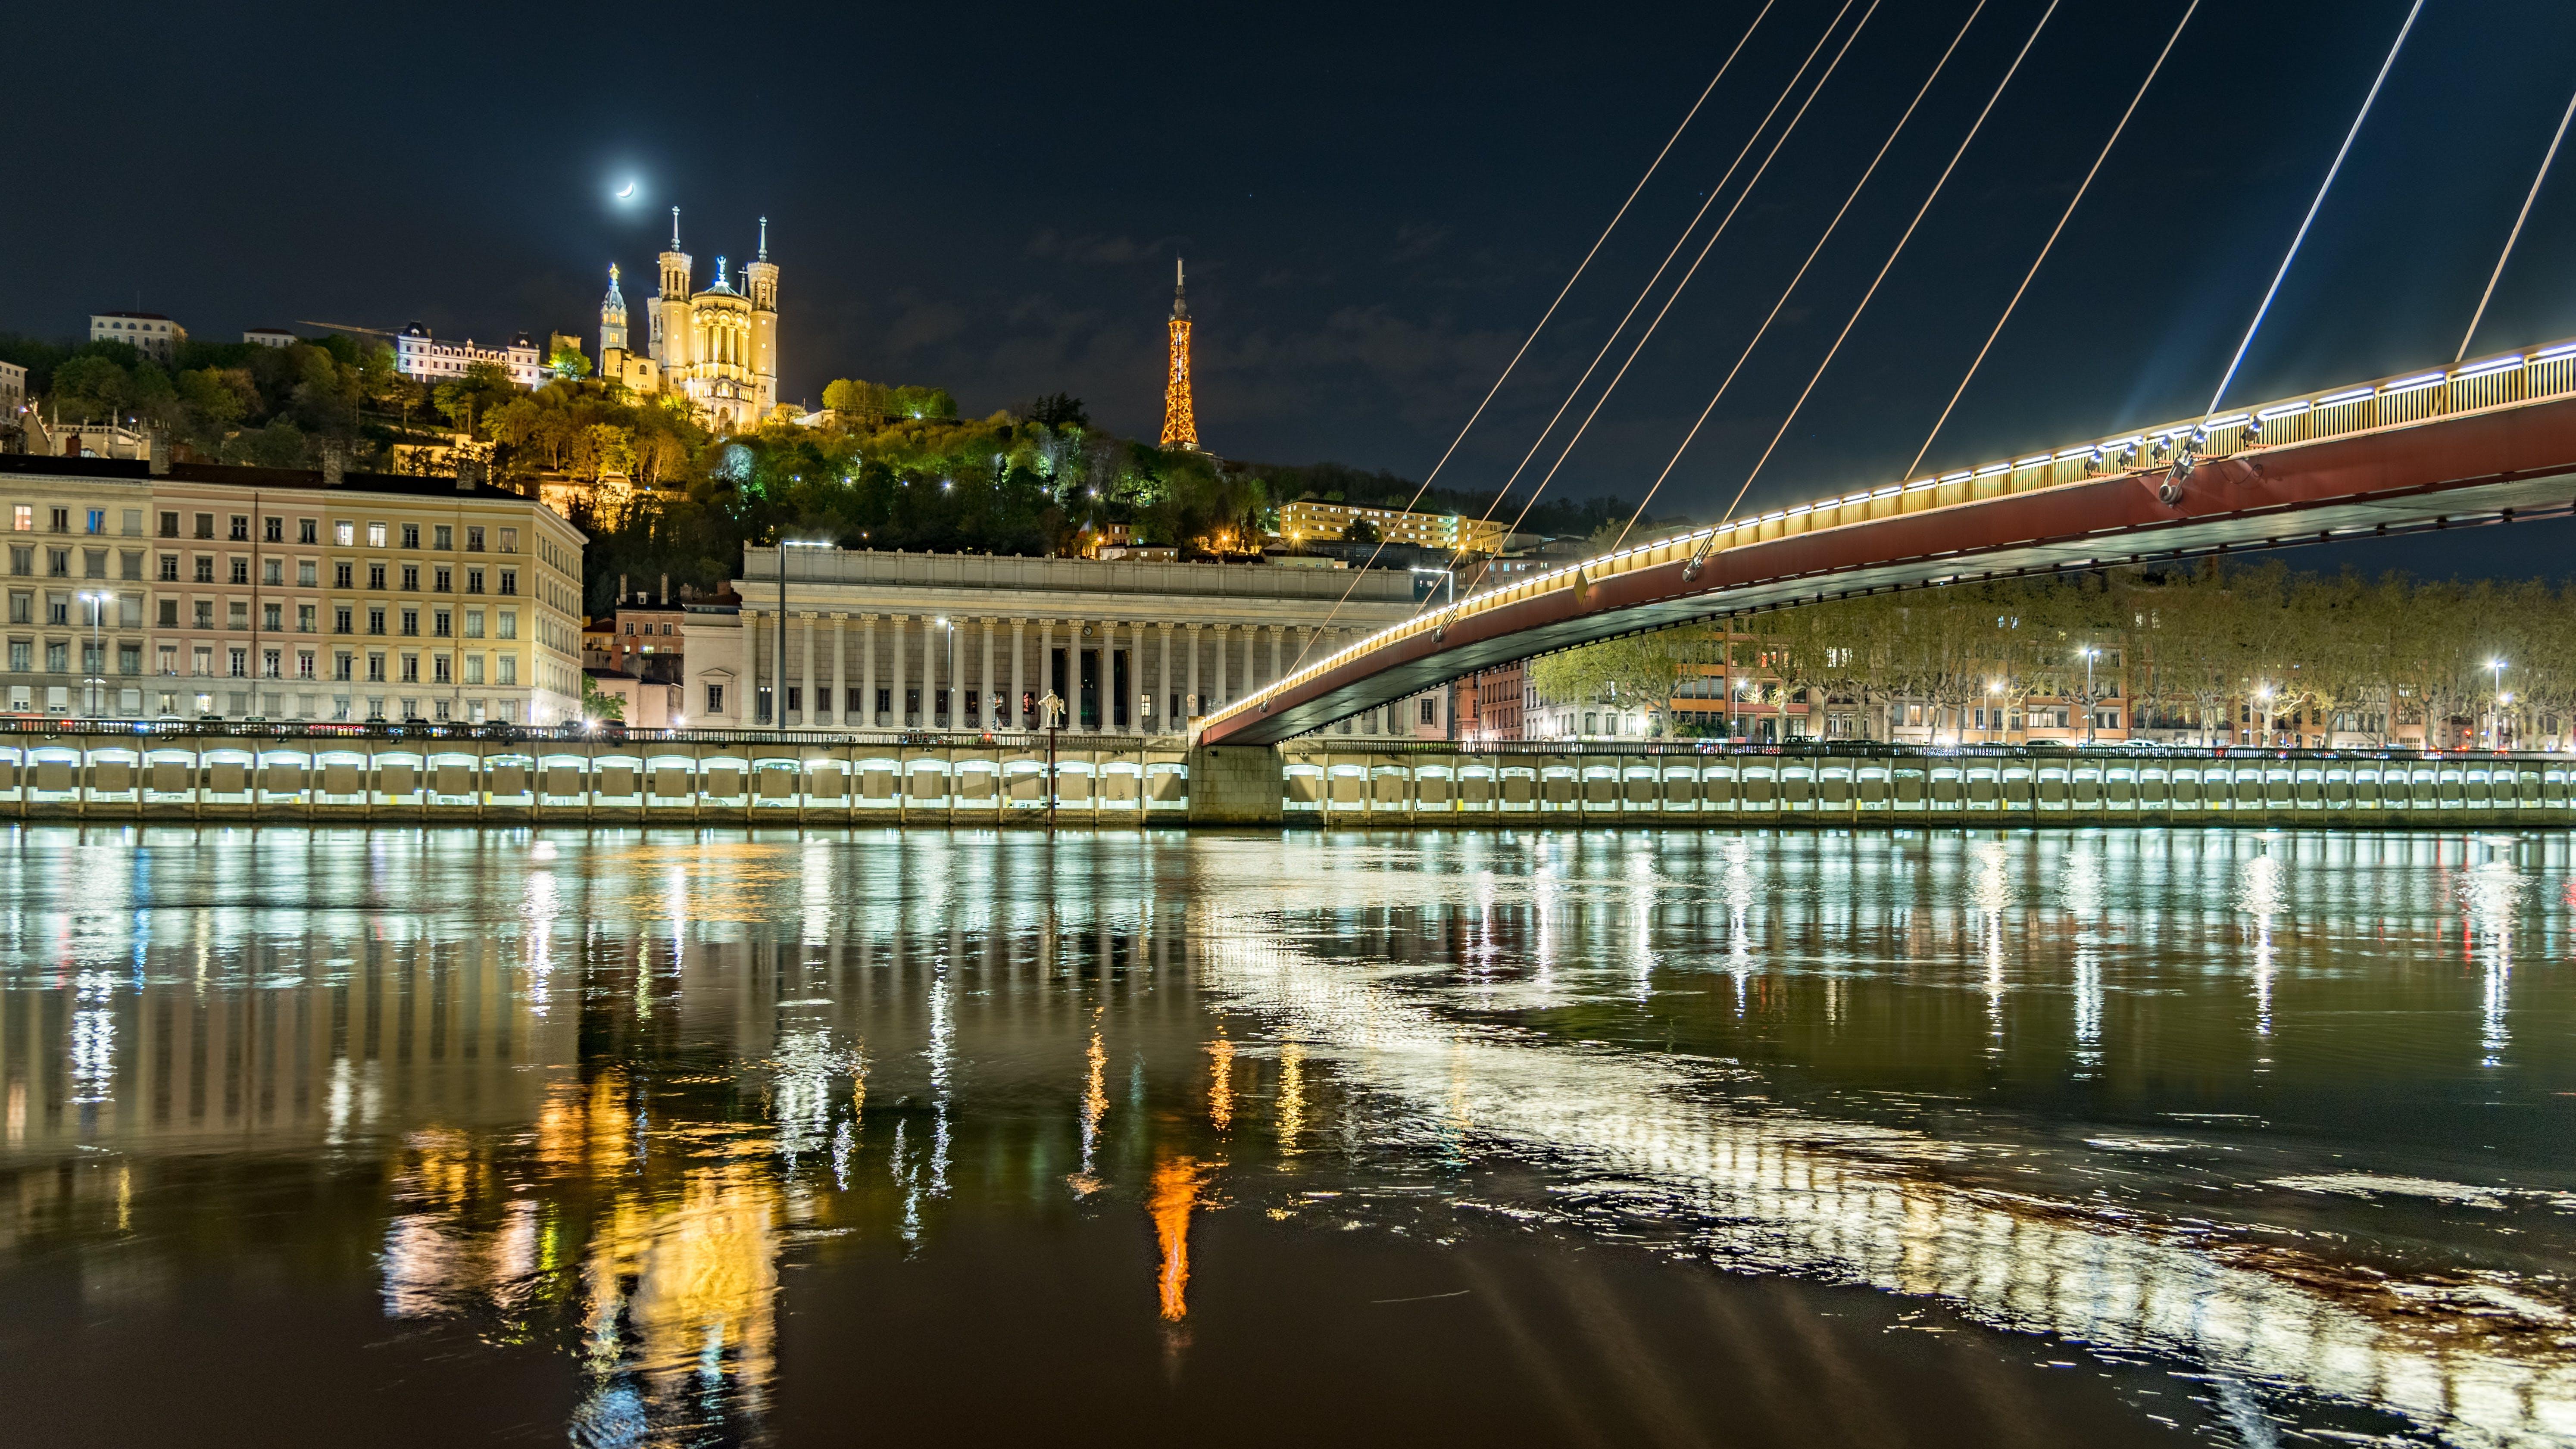 Free stock photo of basilica, bridge, building, cathedral